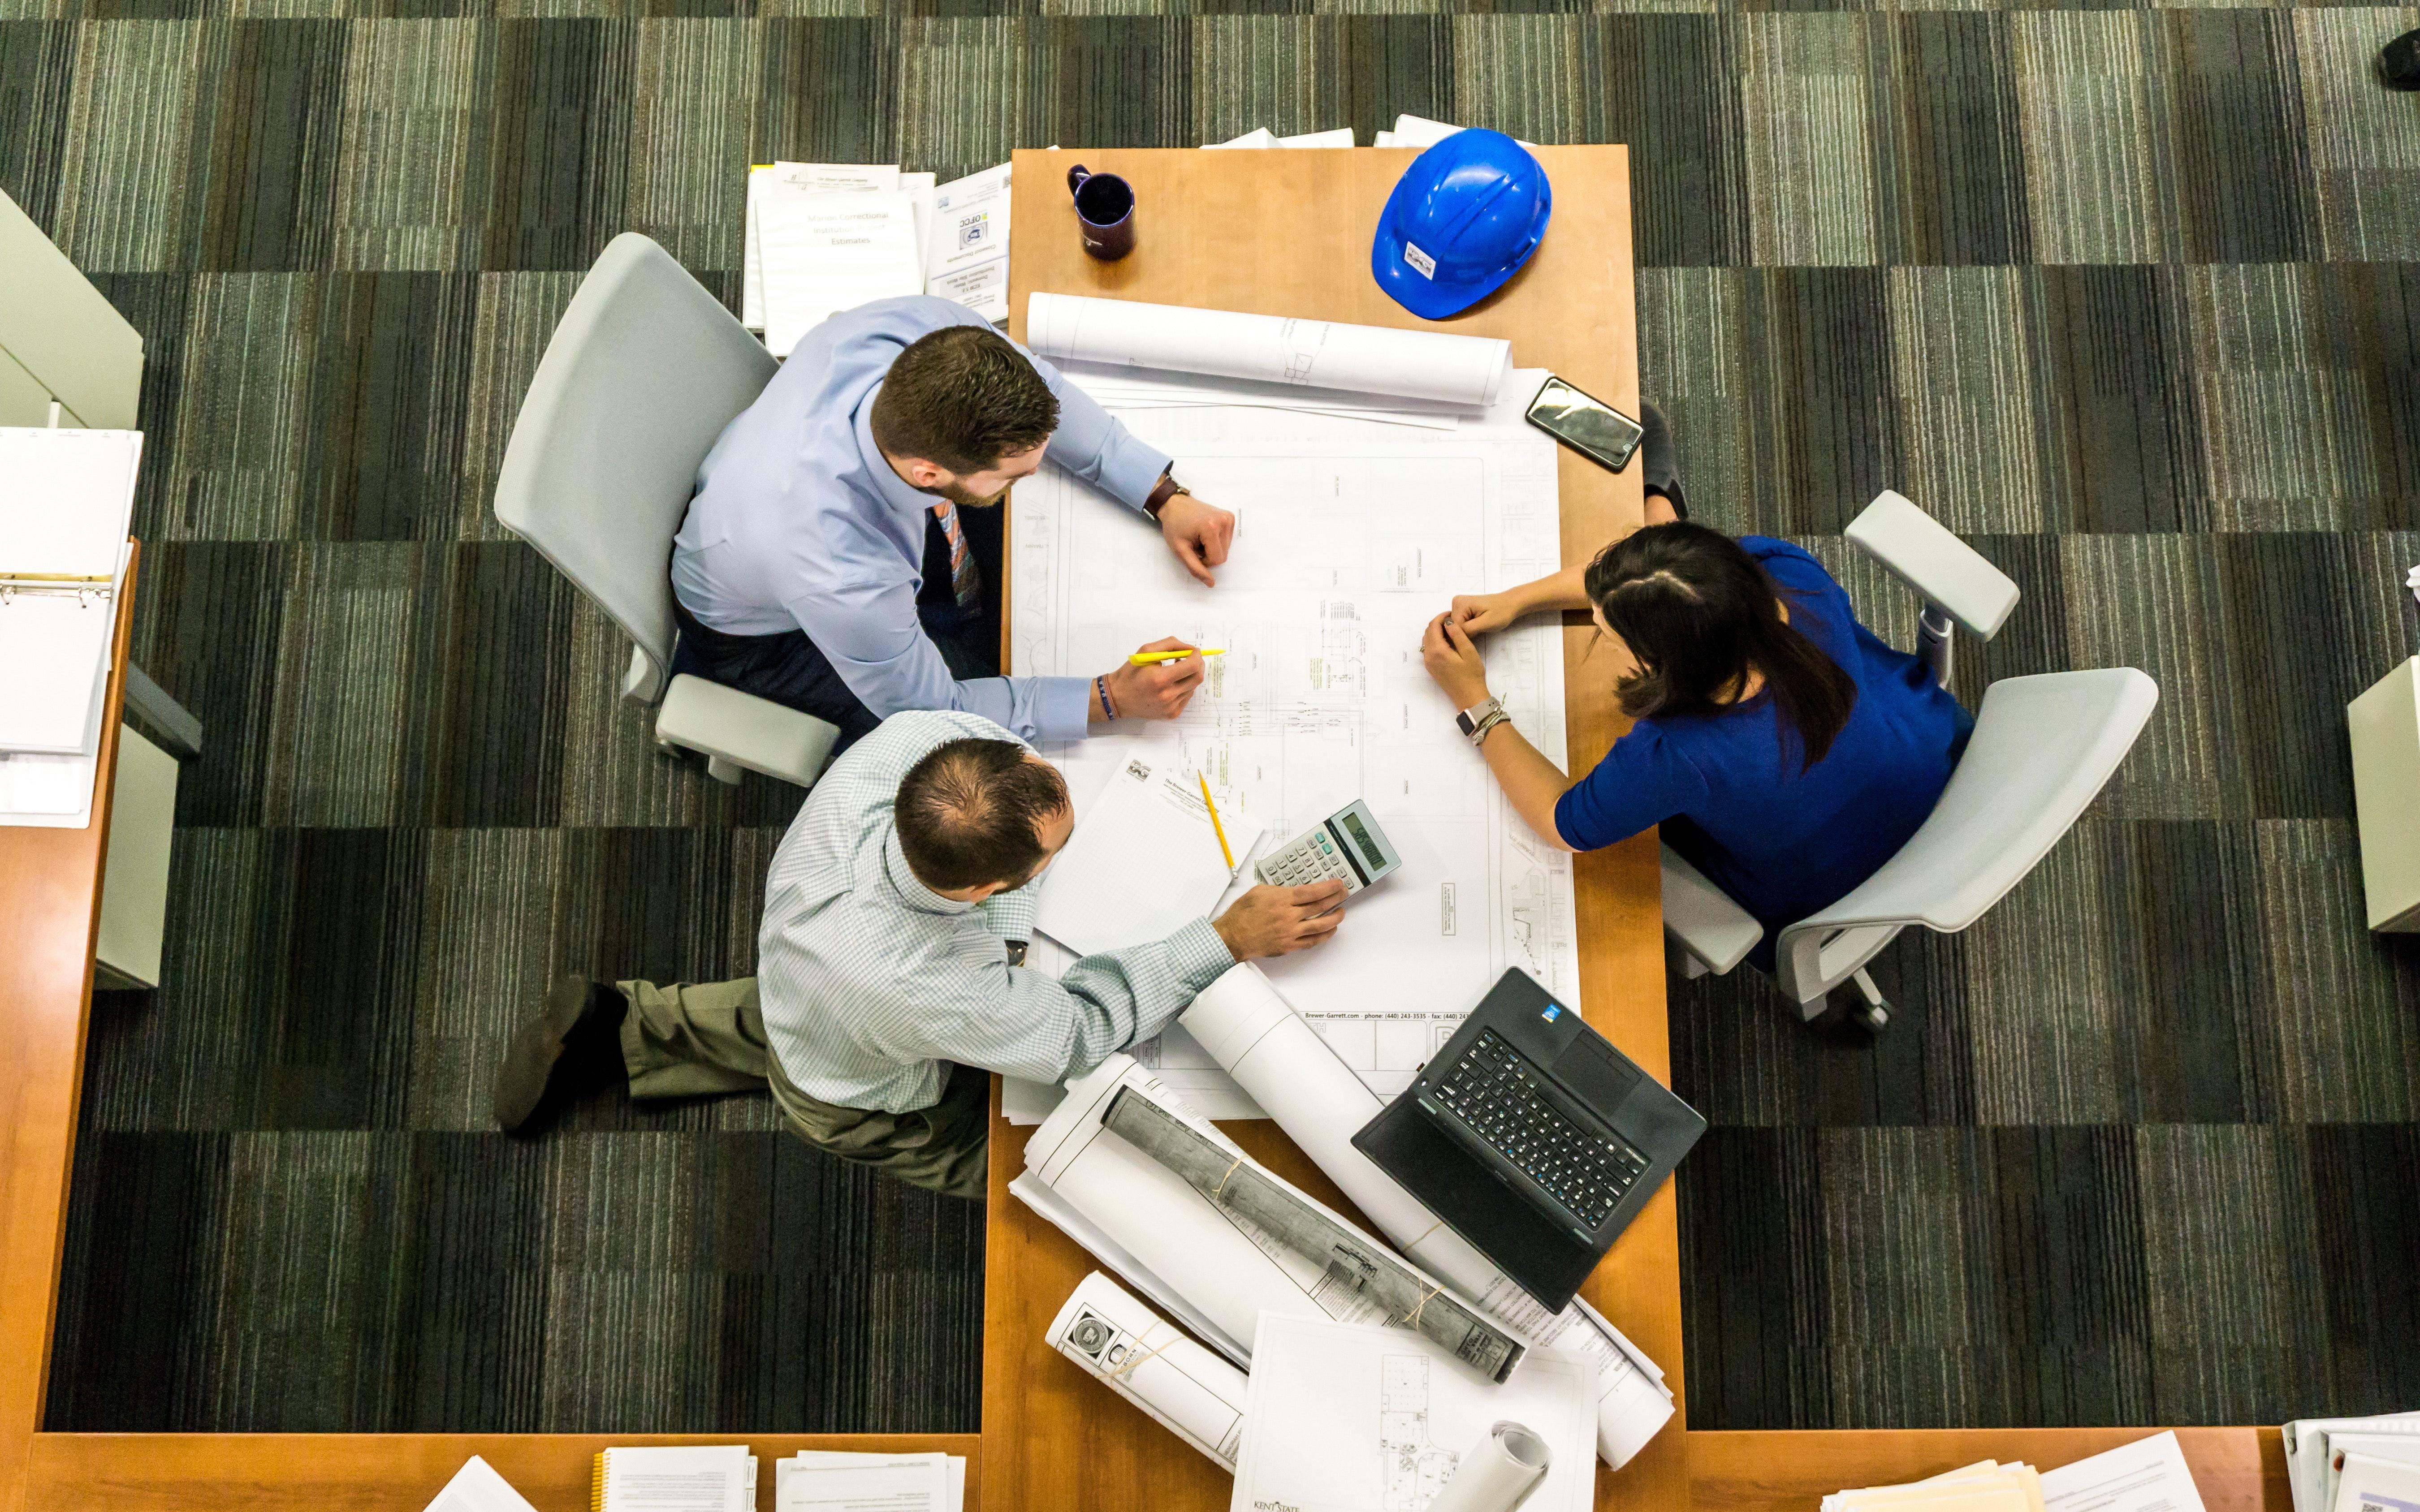 maintenance and repair planning